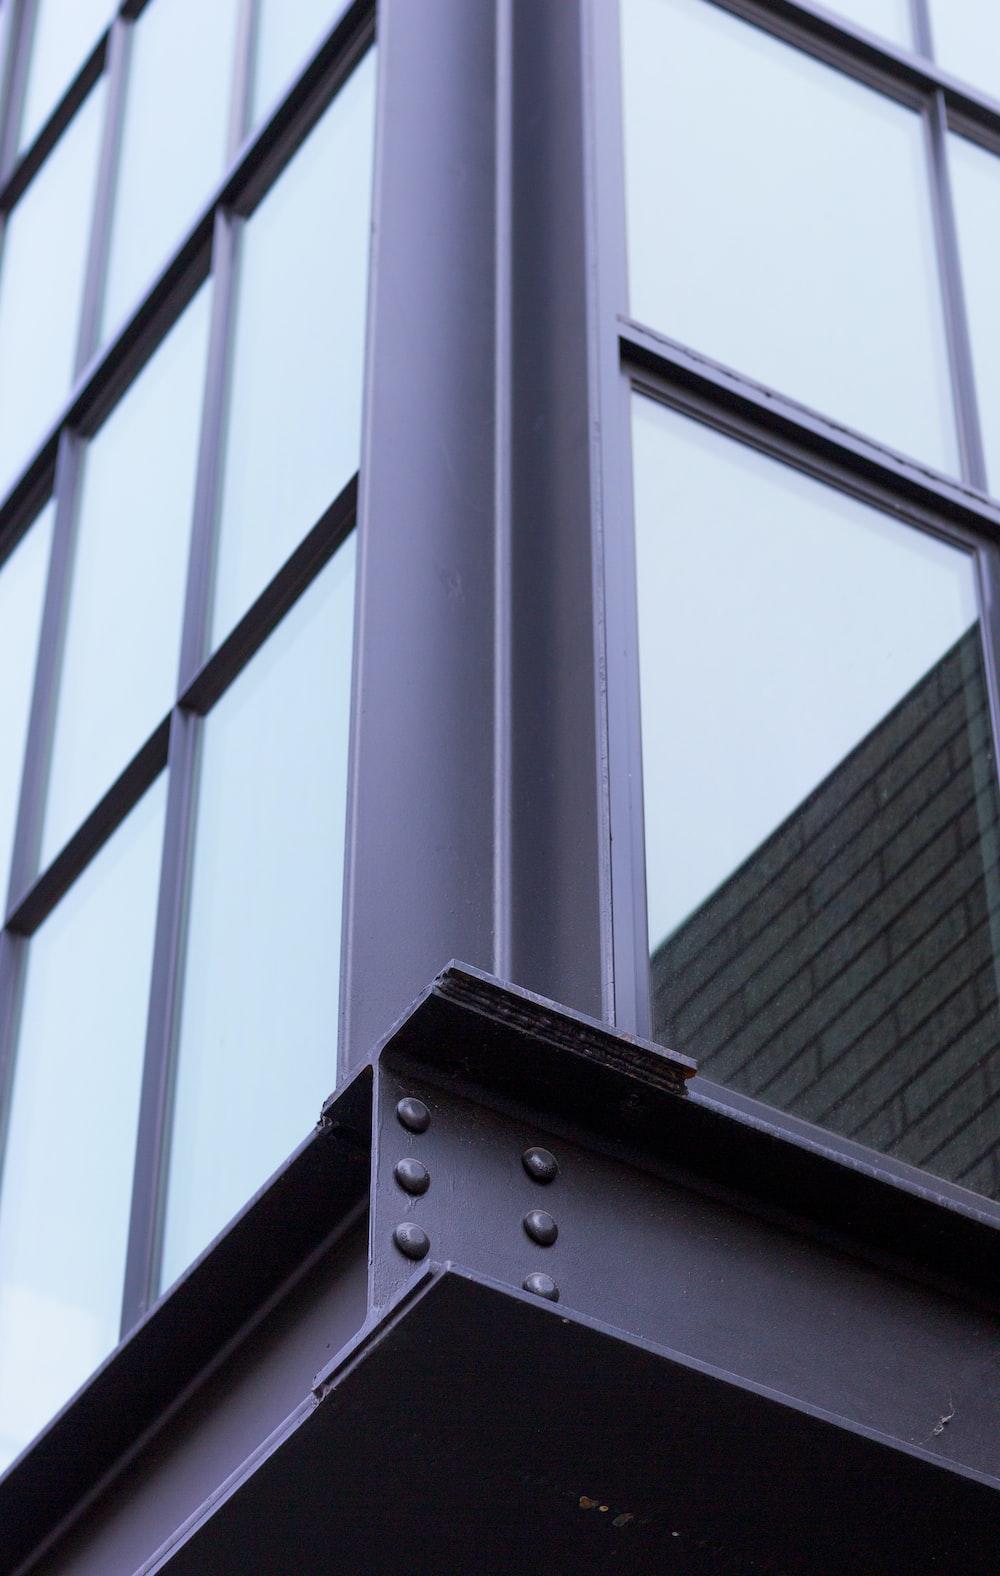 gray metal framed clear glass window